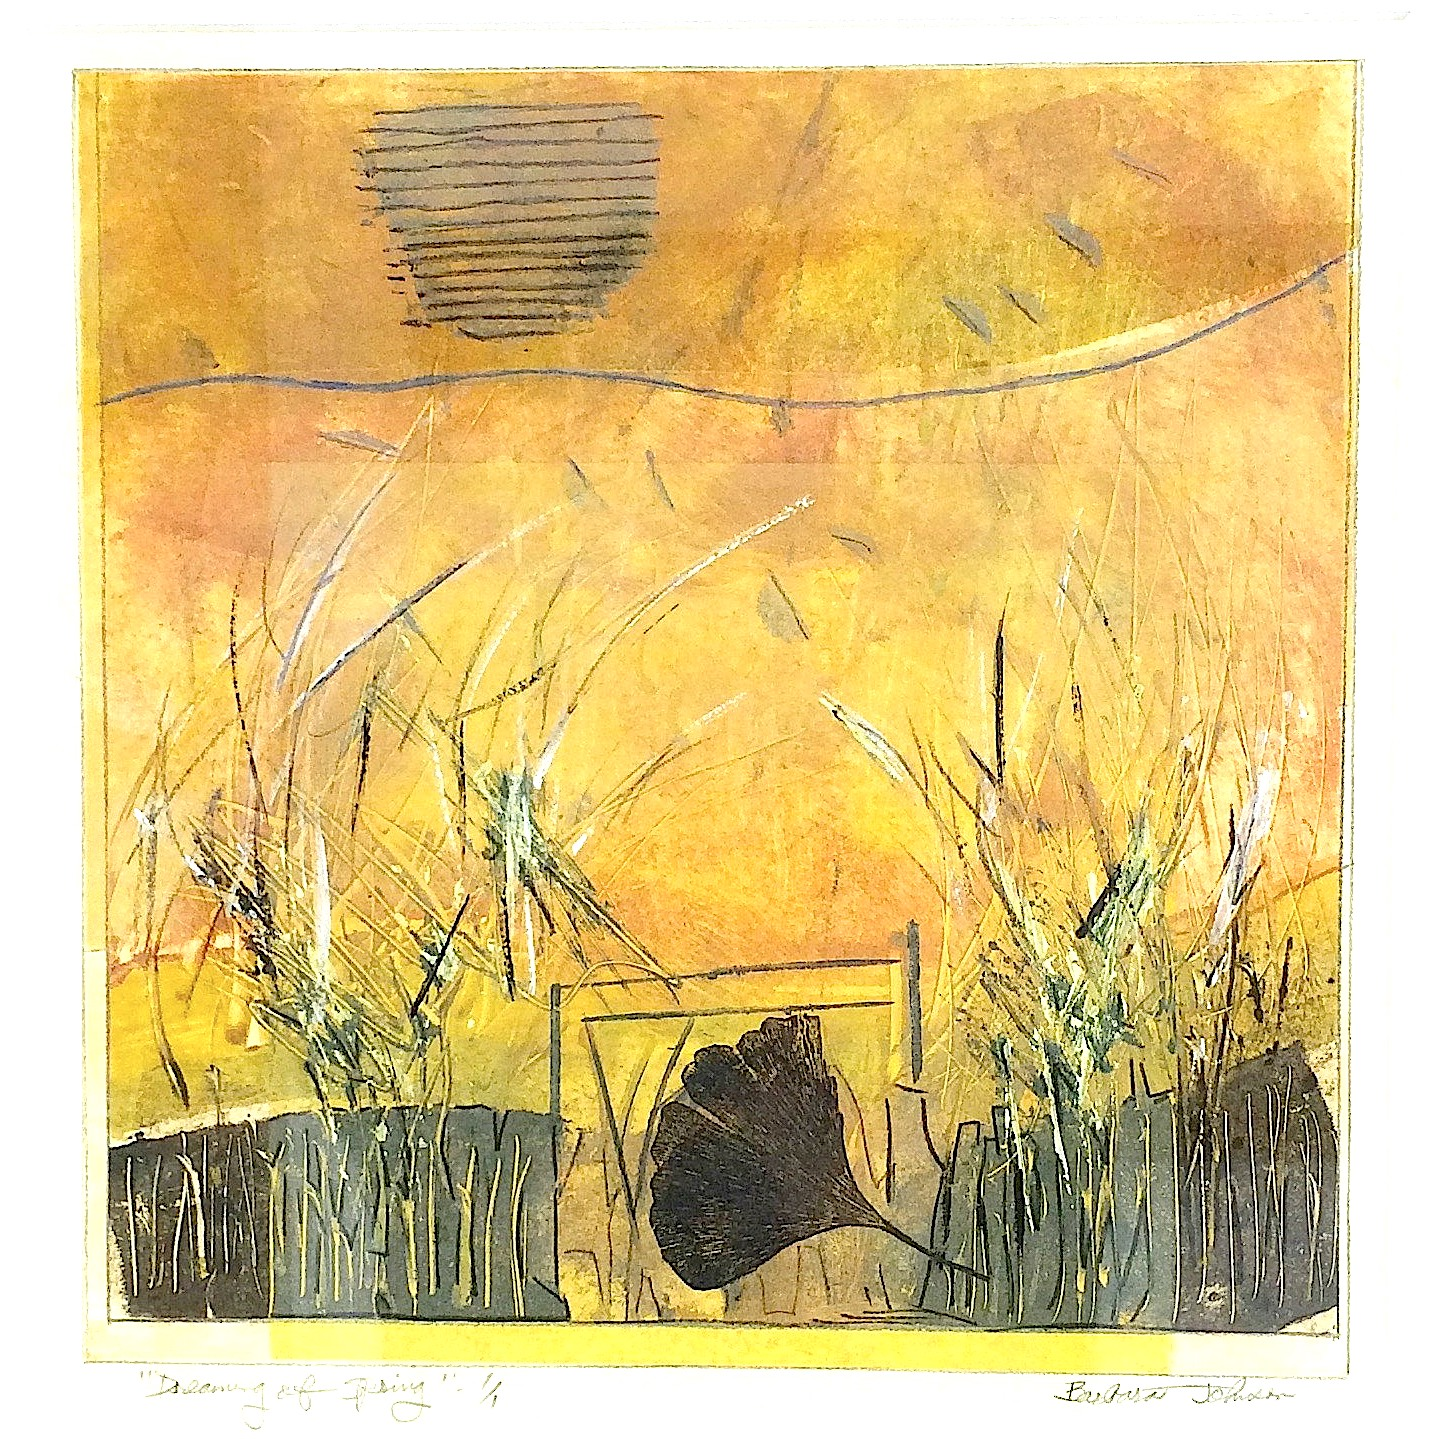 Dreaming of Spring by Barbara Johnson